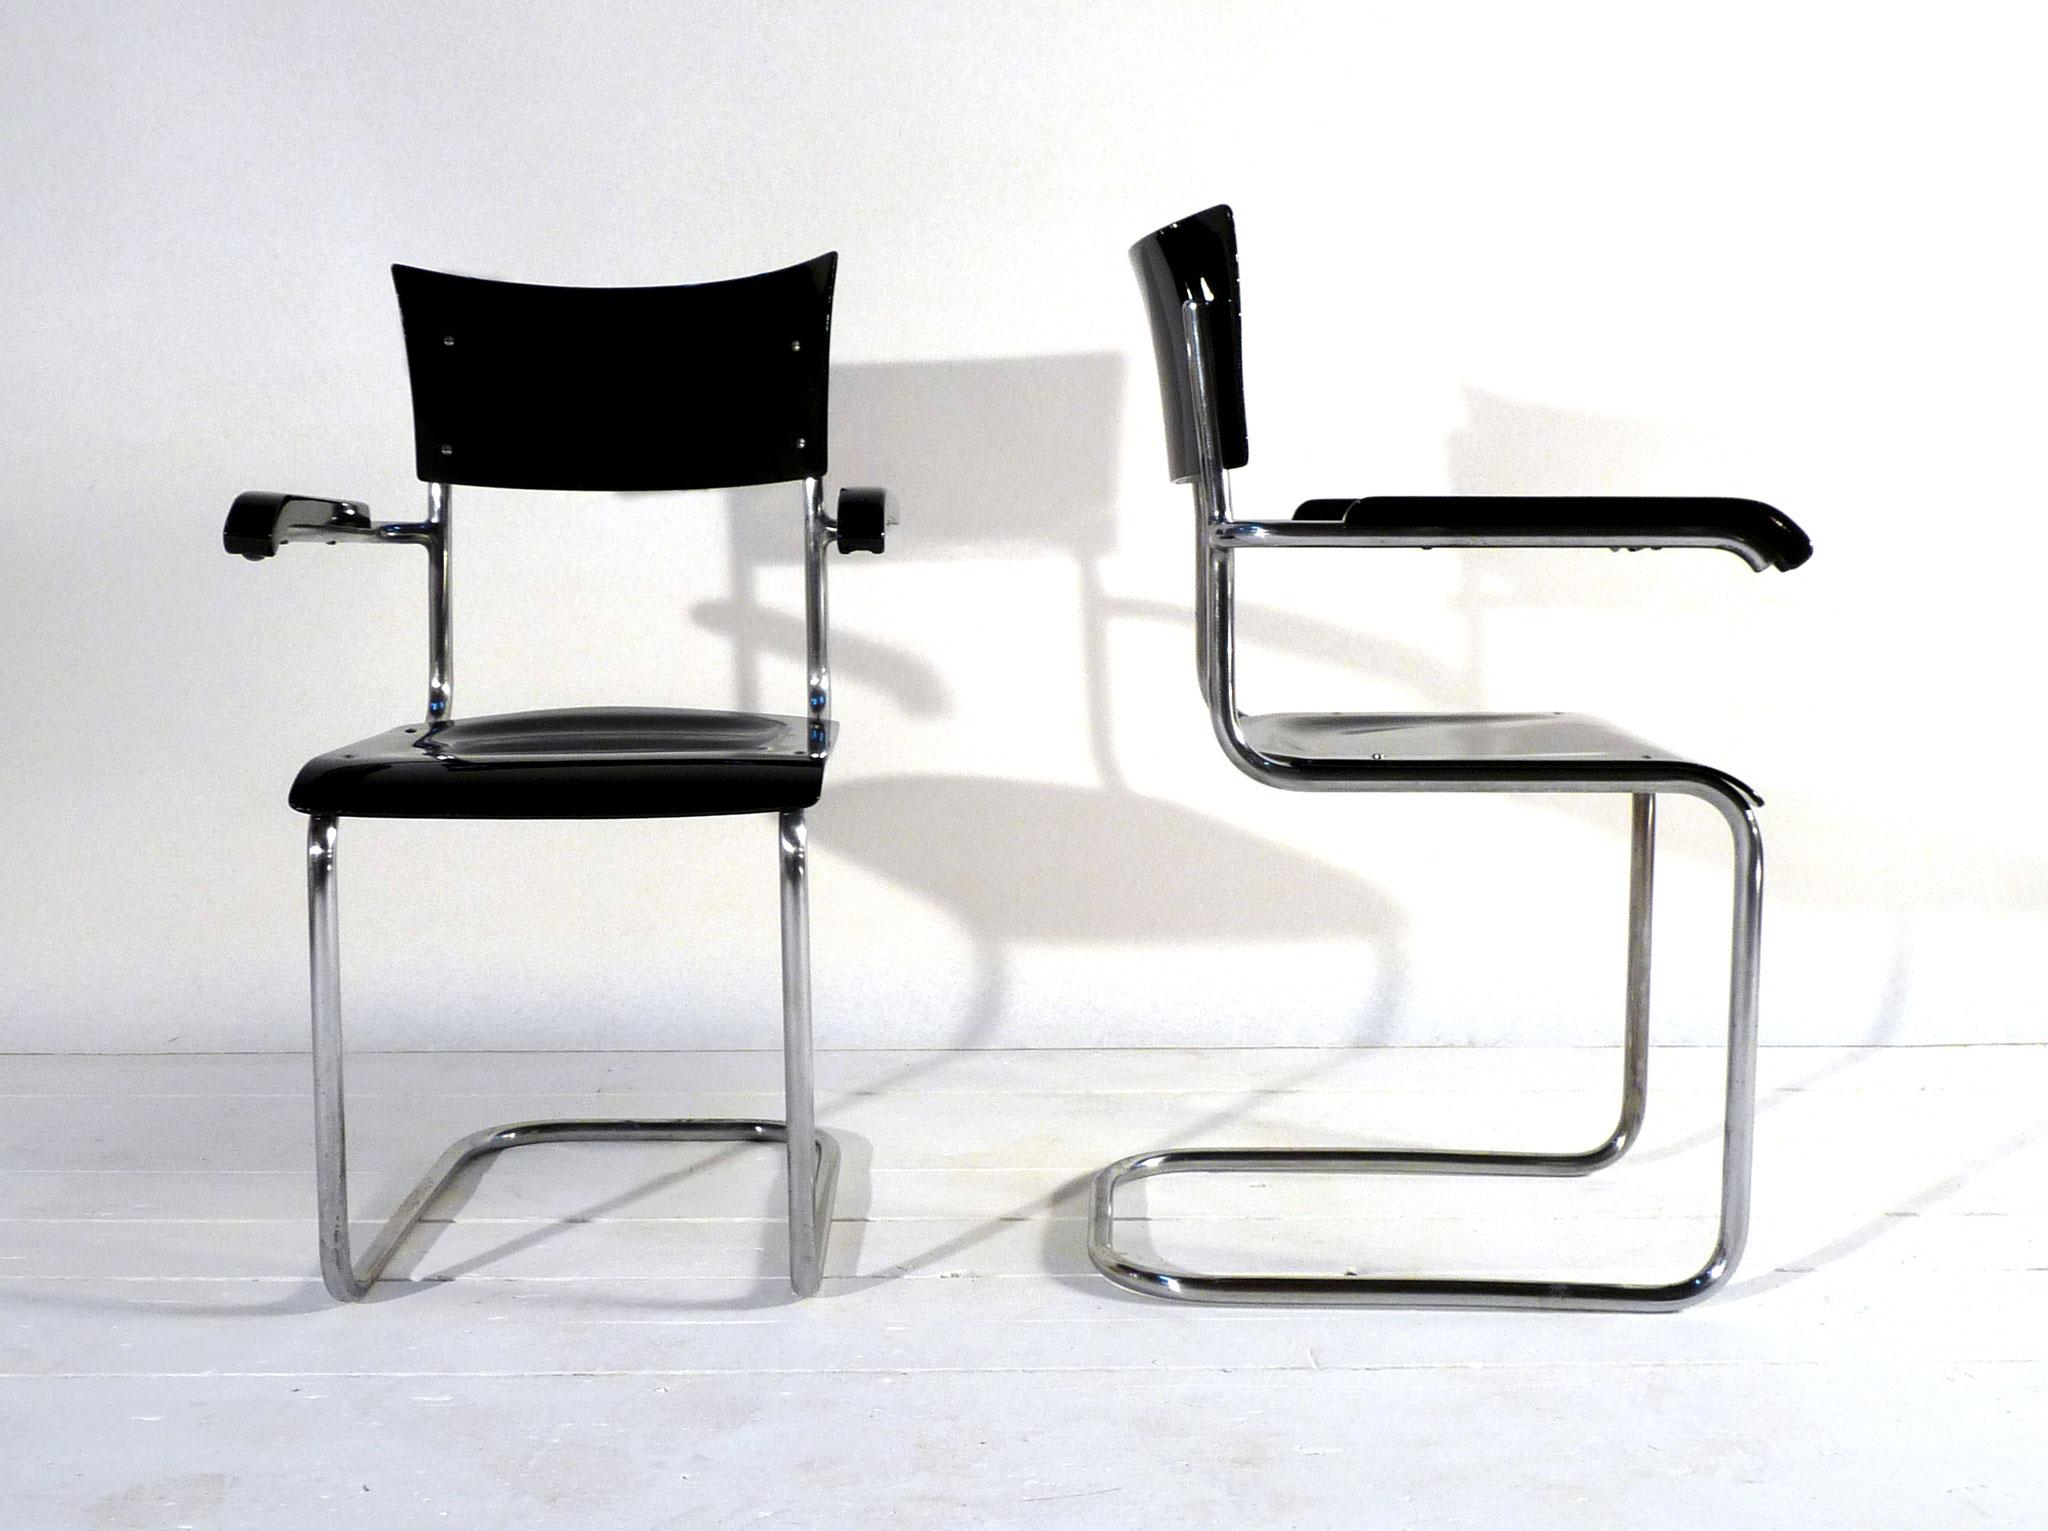 Bauhaus Originale Bauhaus Mobel Sessel Stuhl Sofa Lampe Von